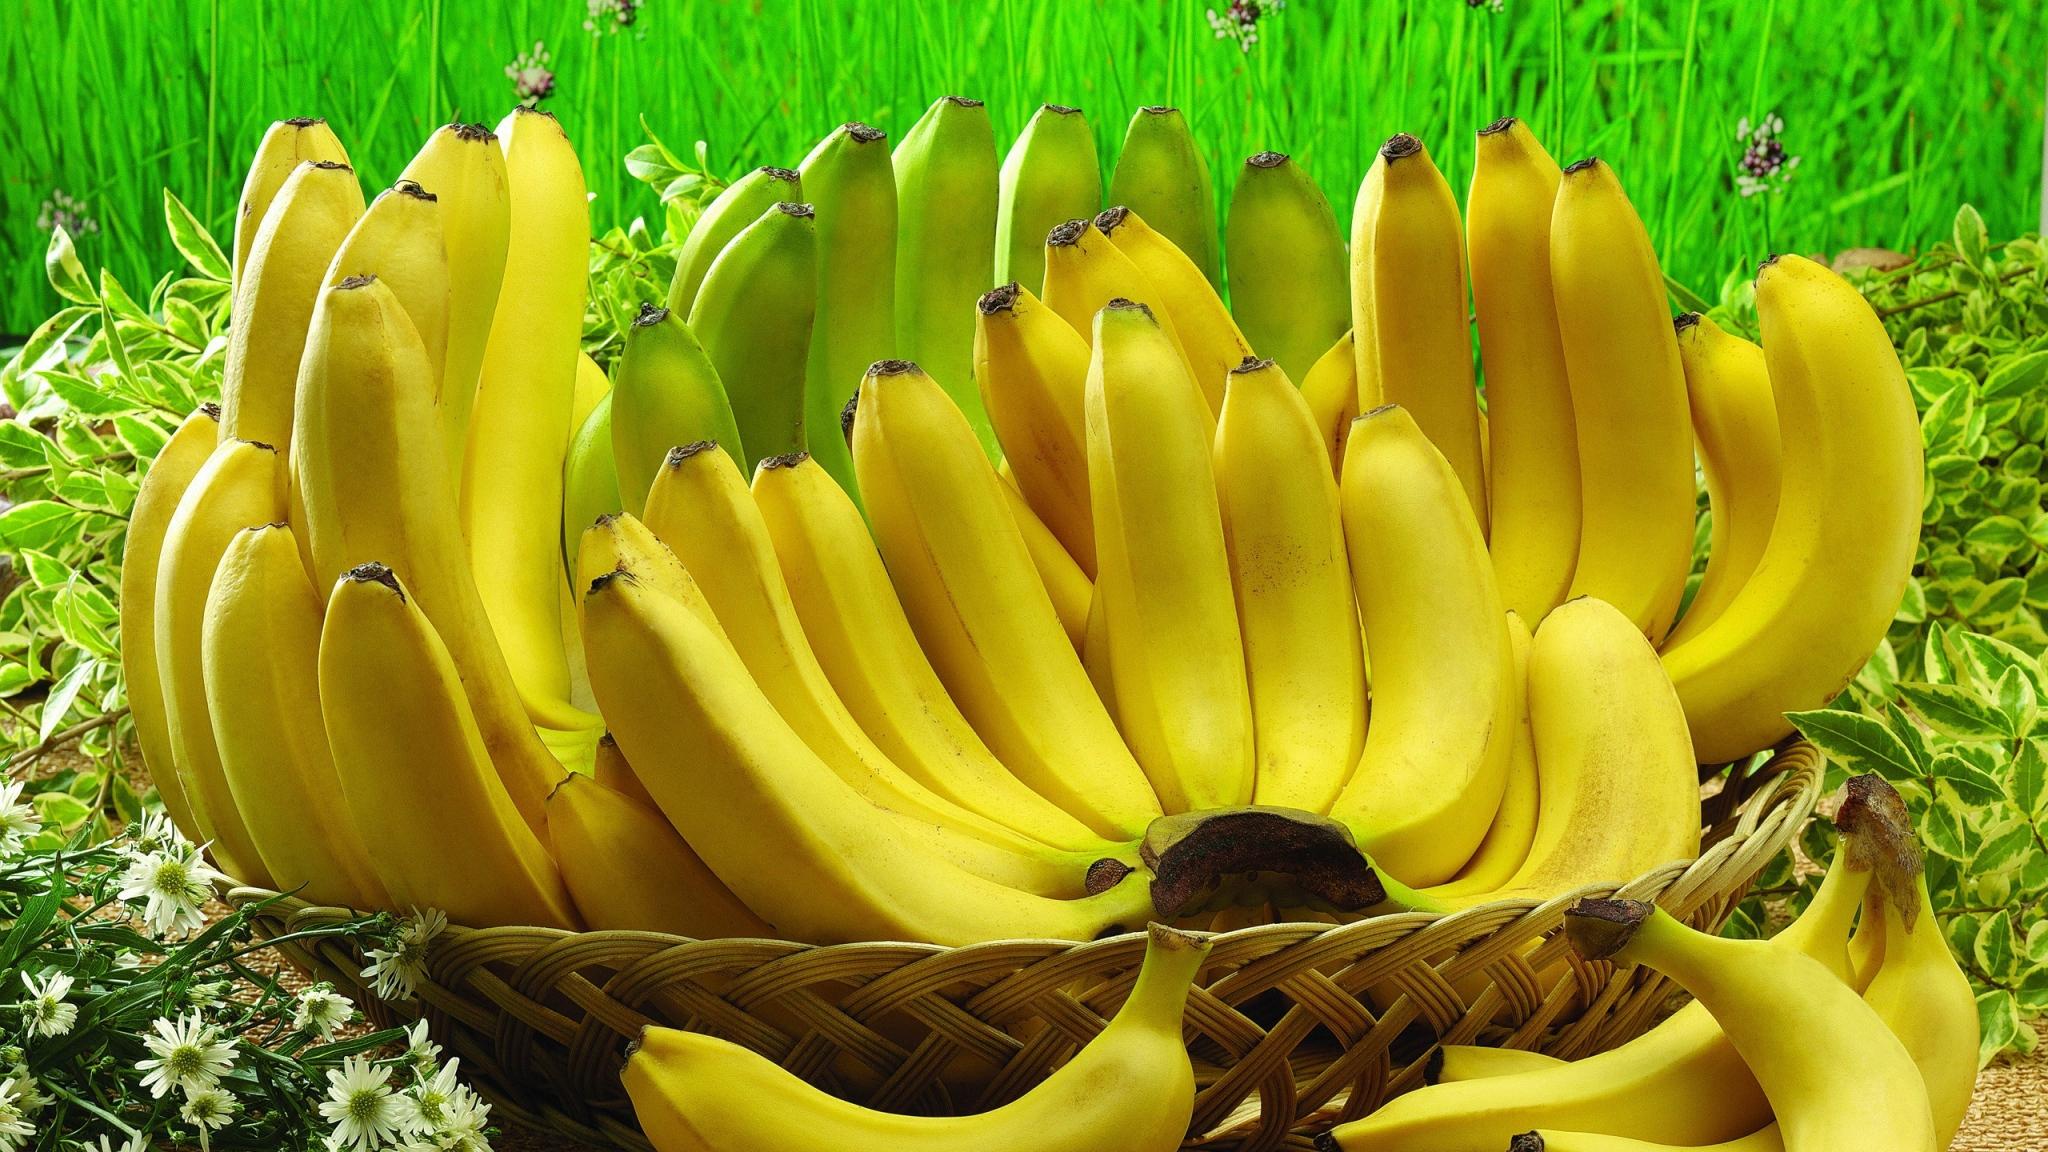 Absolute-Hit-Morning-Banana-Diet